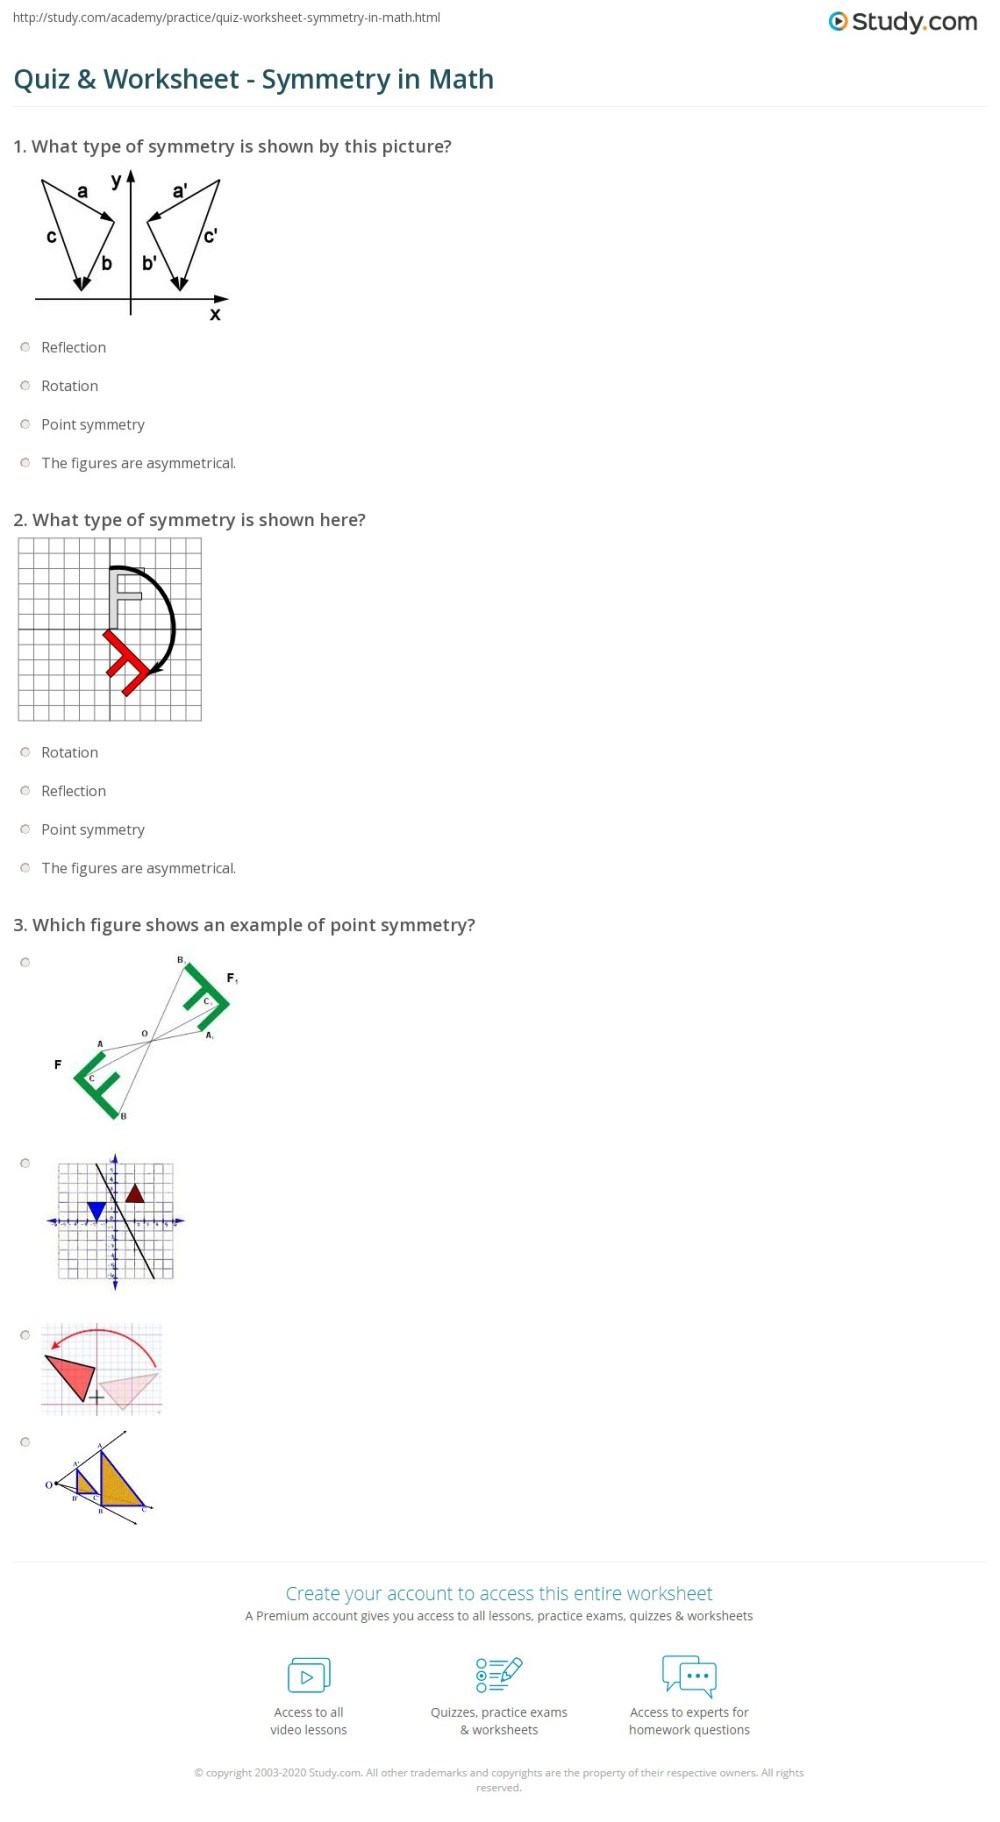 medium resolution of Quiz \u0026 Worksheet - Symmetry in Math   Study.com